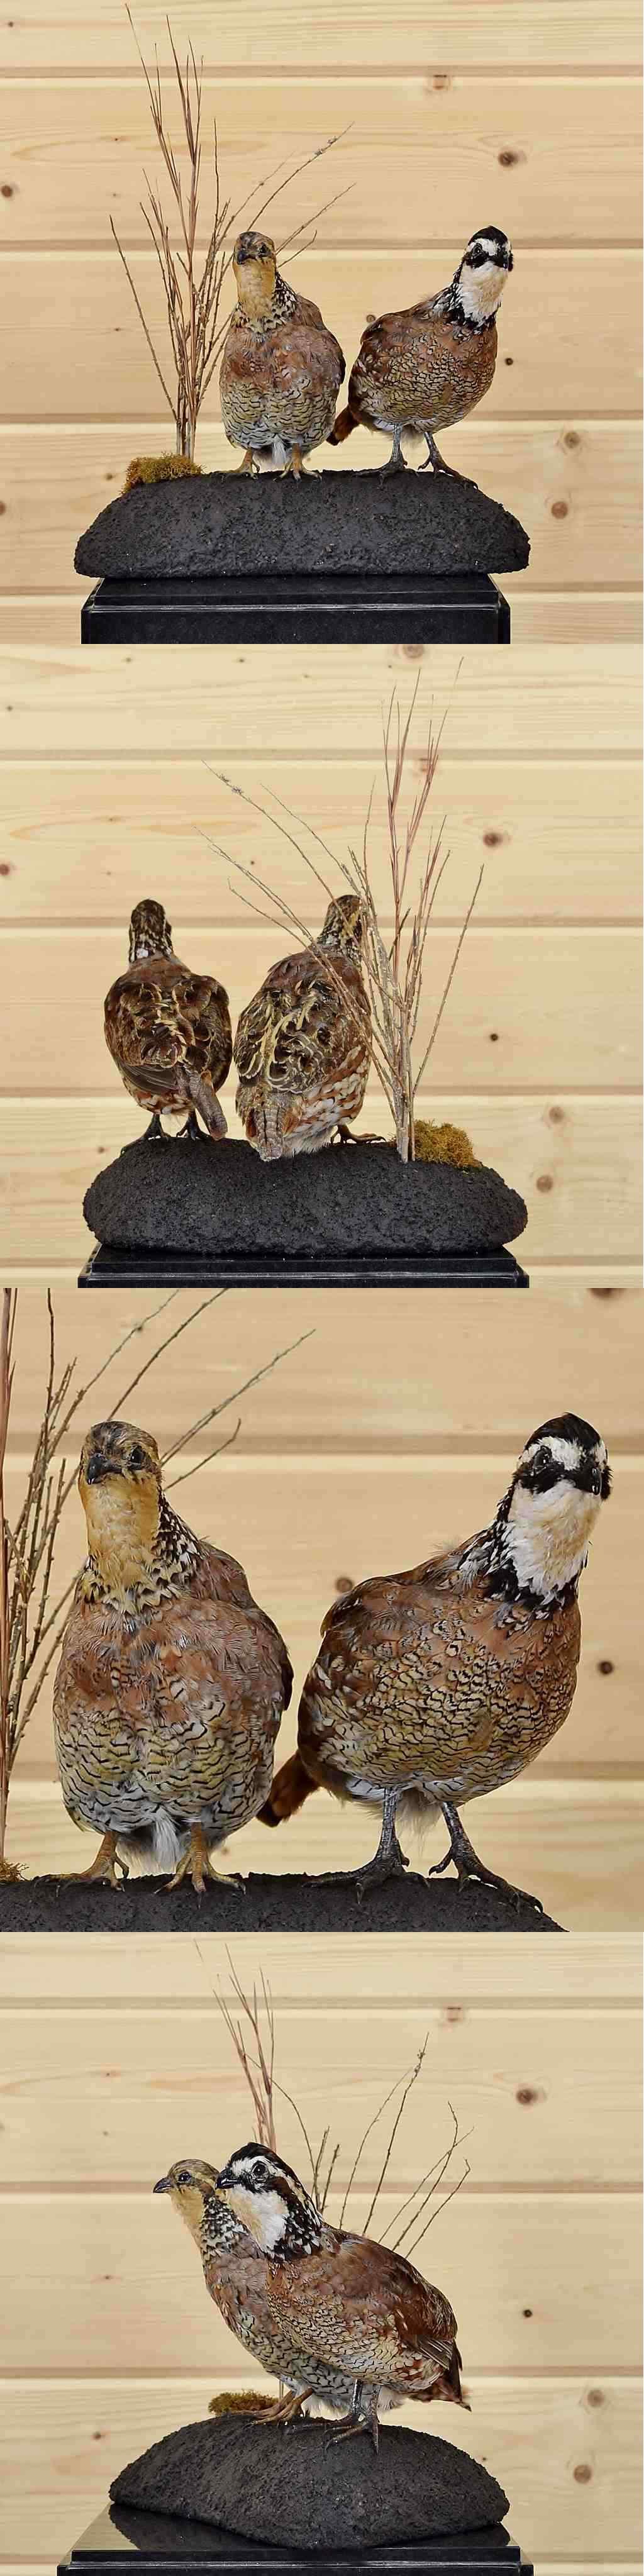 Birds 71123: Bobwhite Quail Pair Taxidermy - Sw4519 -> BUY